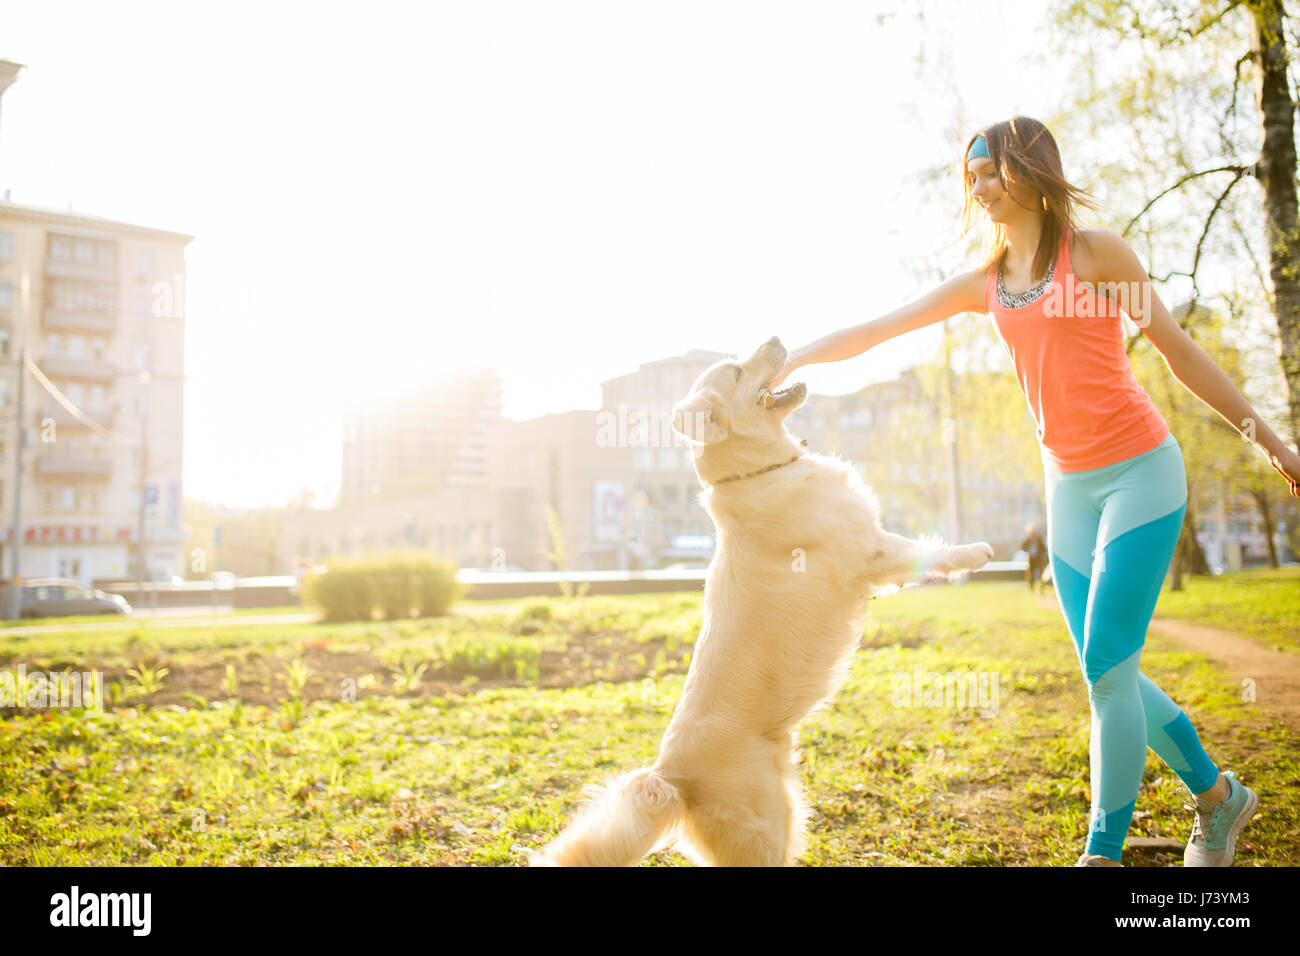 Junge Brünette spielen mit Hund Stockbild